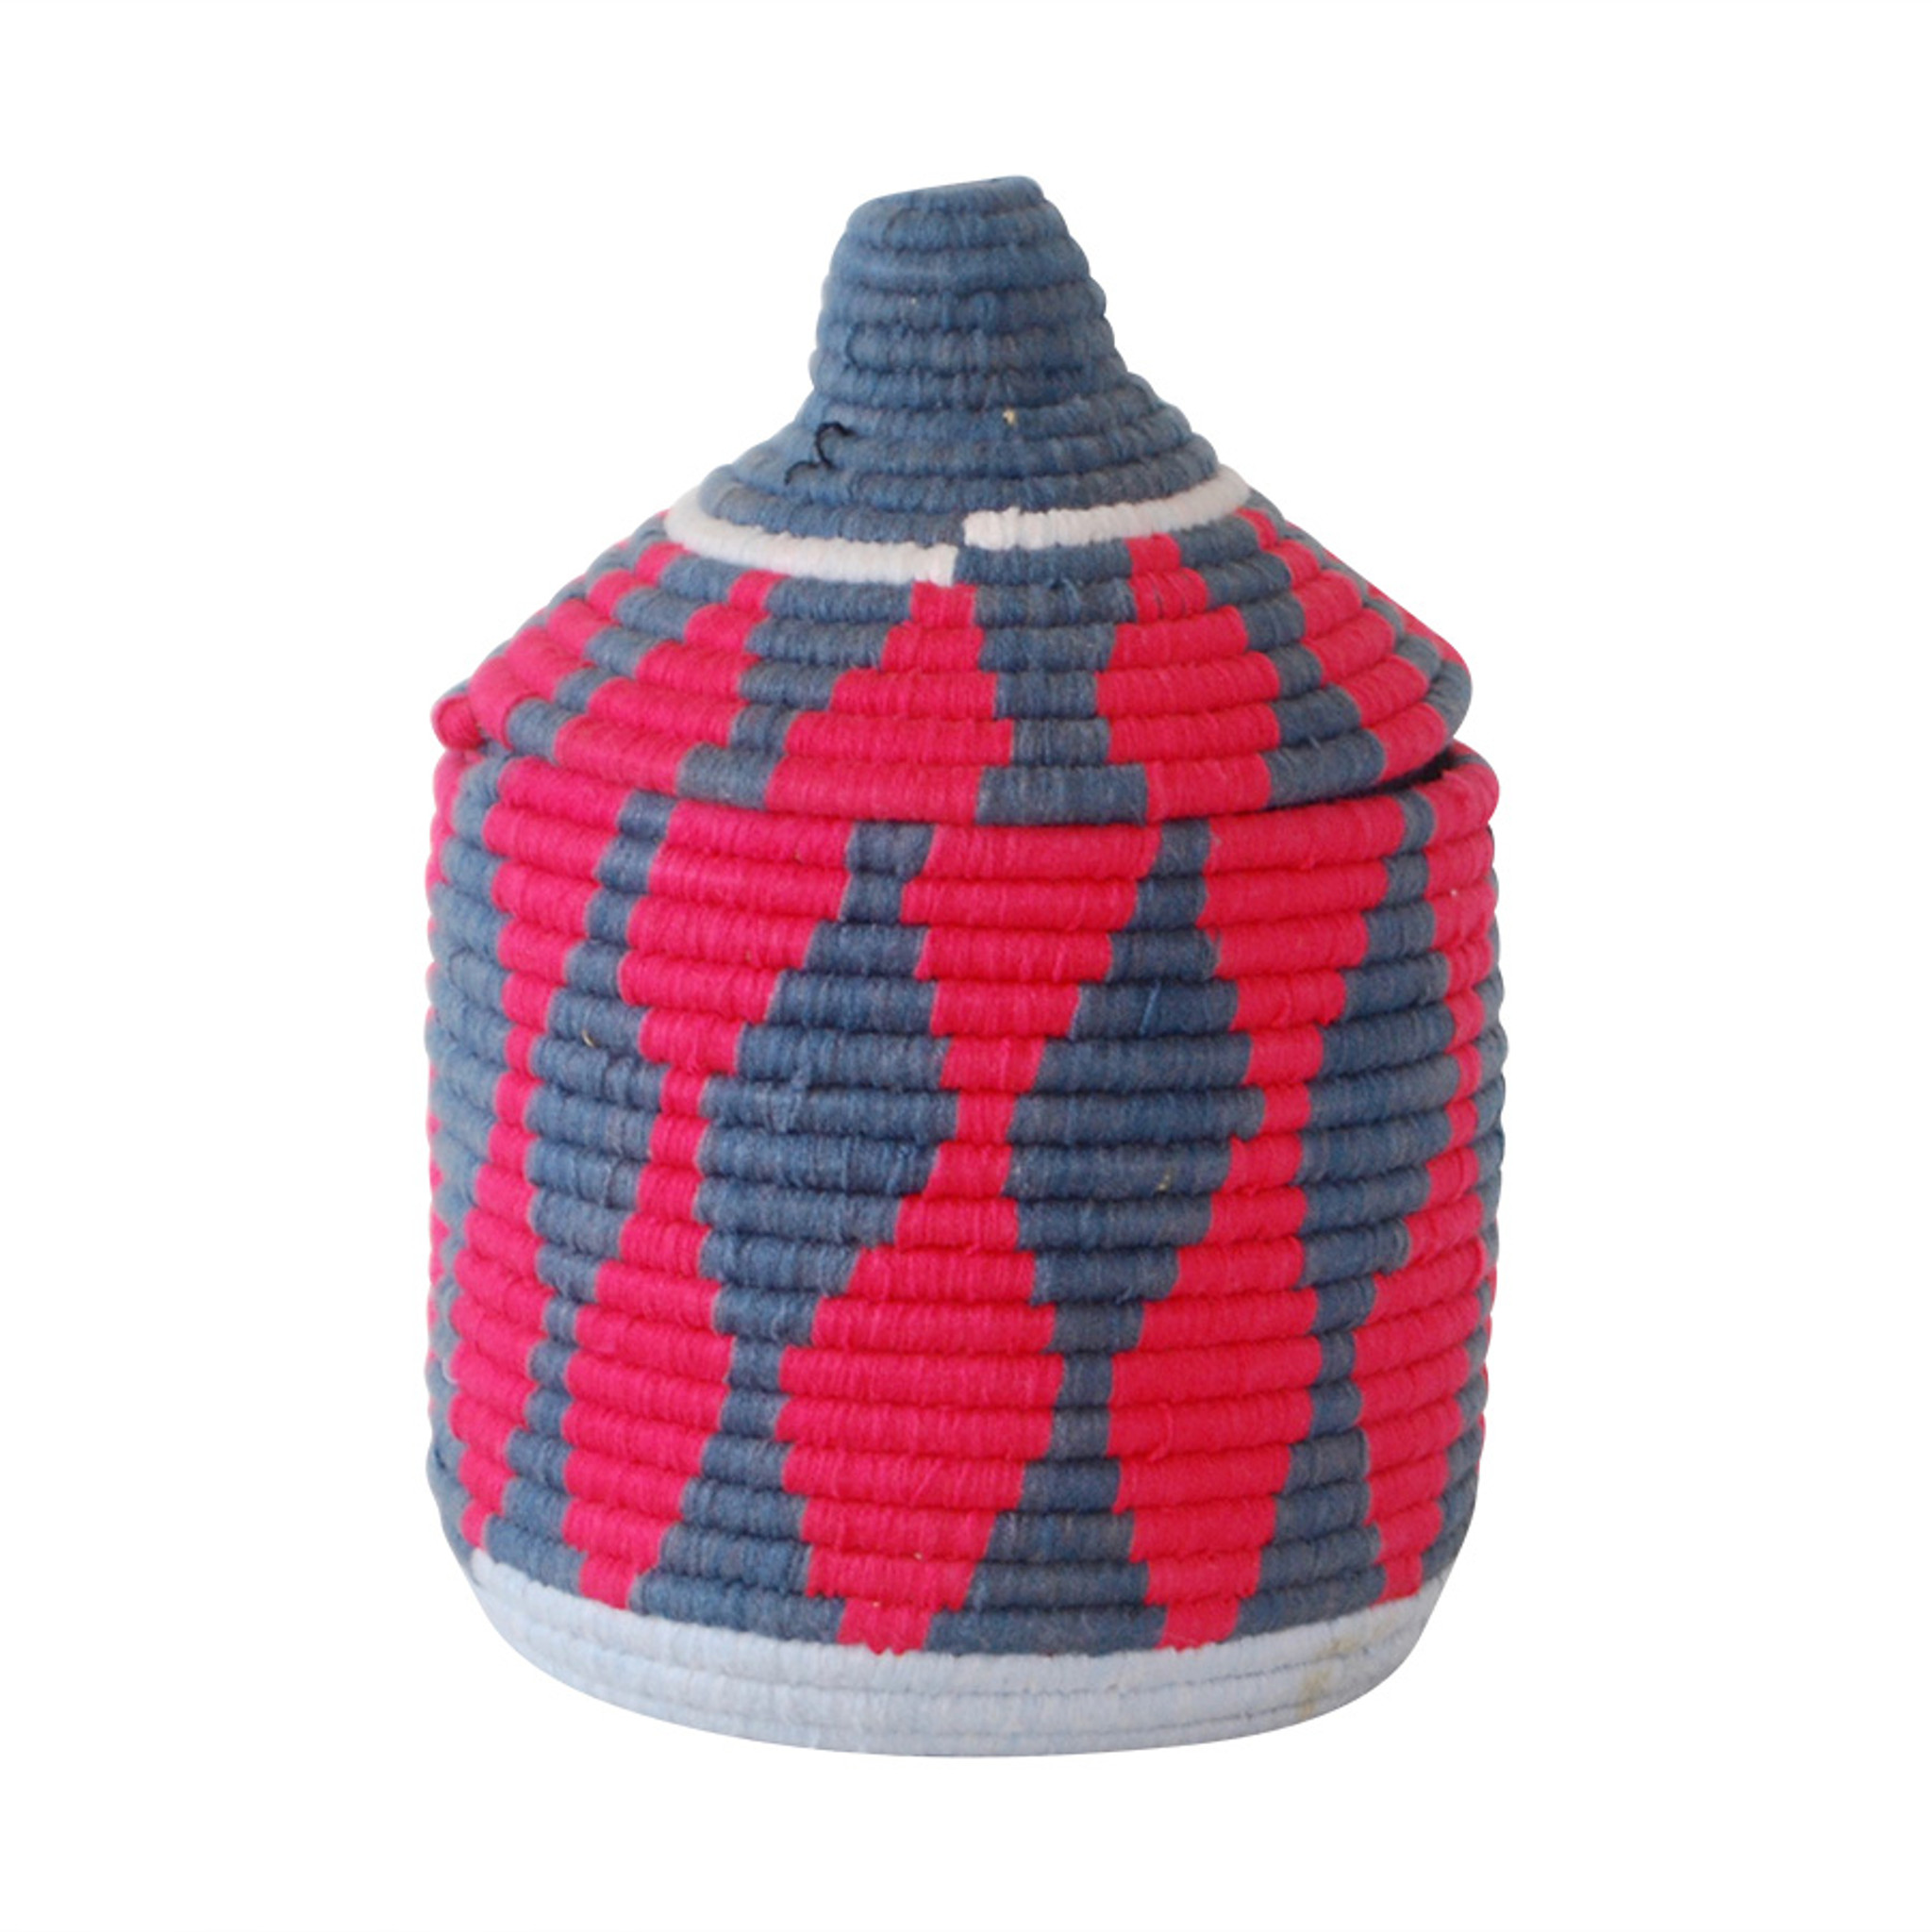 Moroccan Bread Basket Pink Amp Grey Sheherazade 174 Home